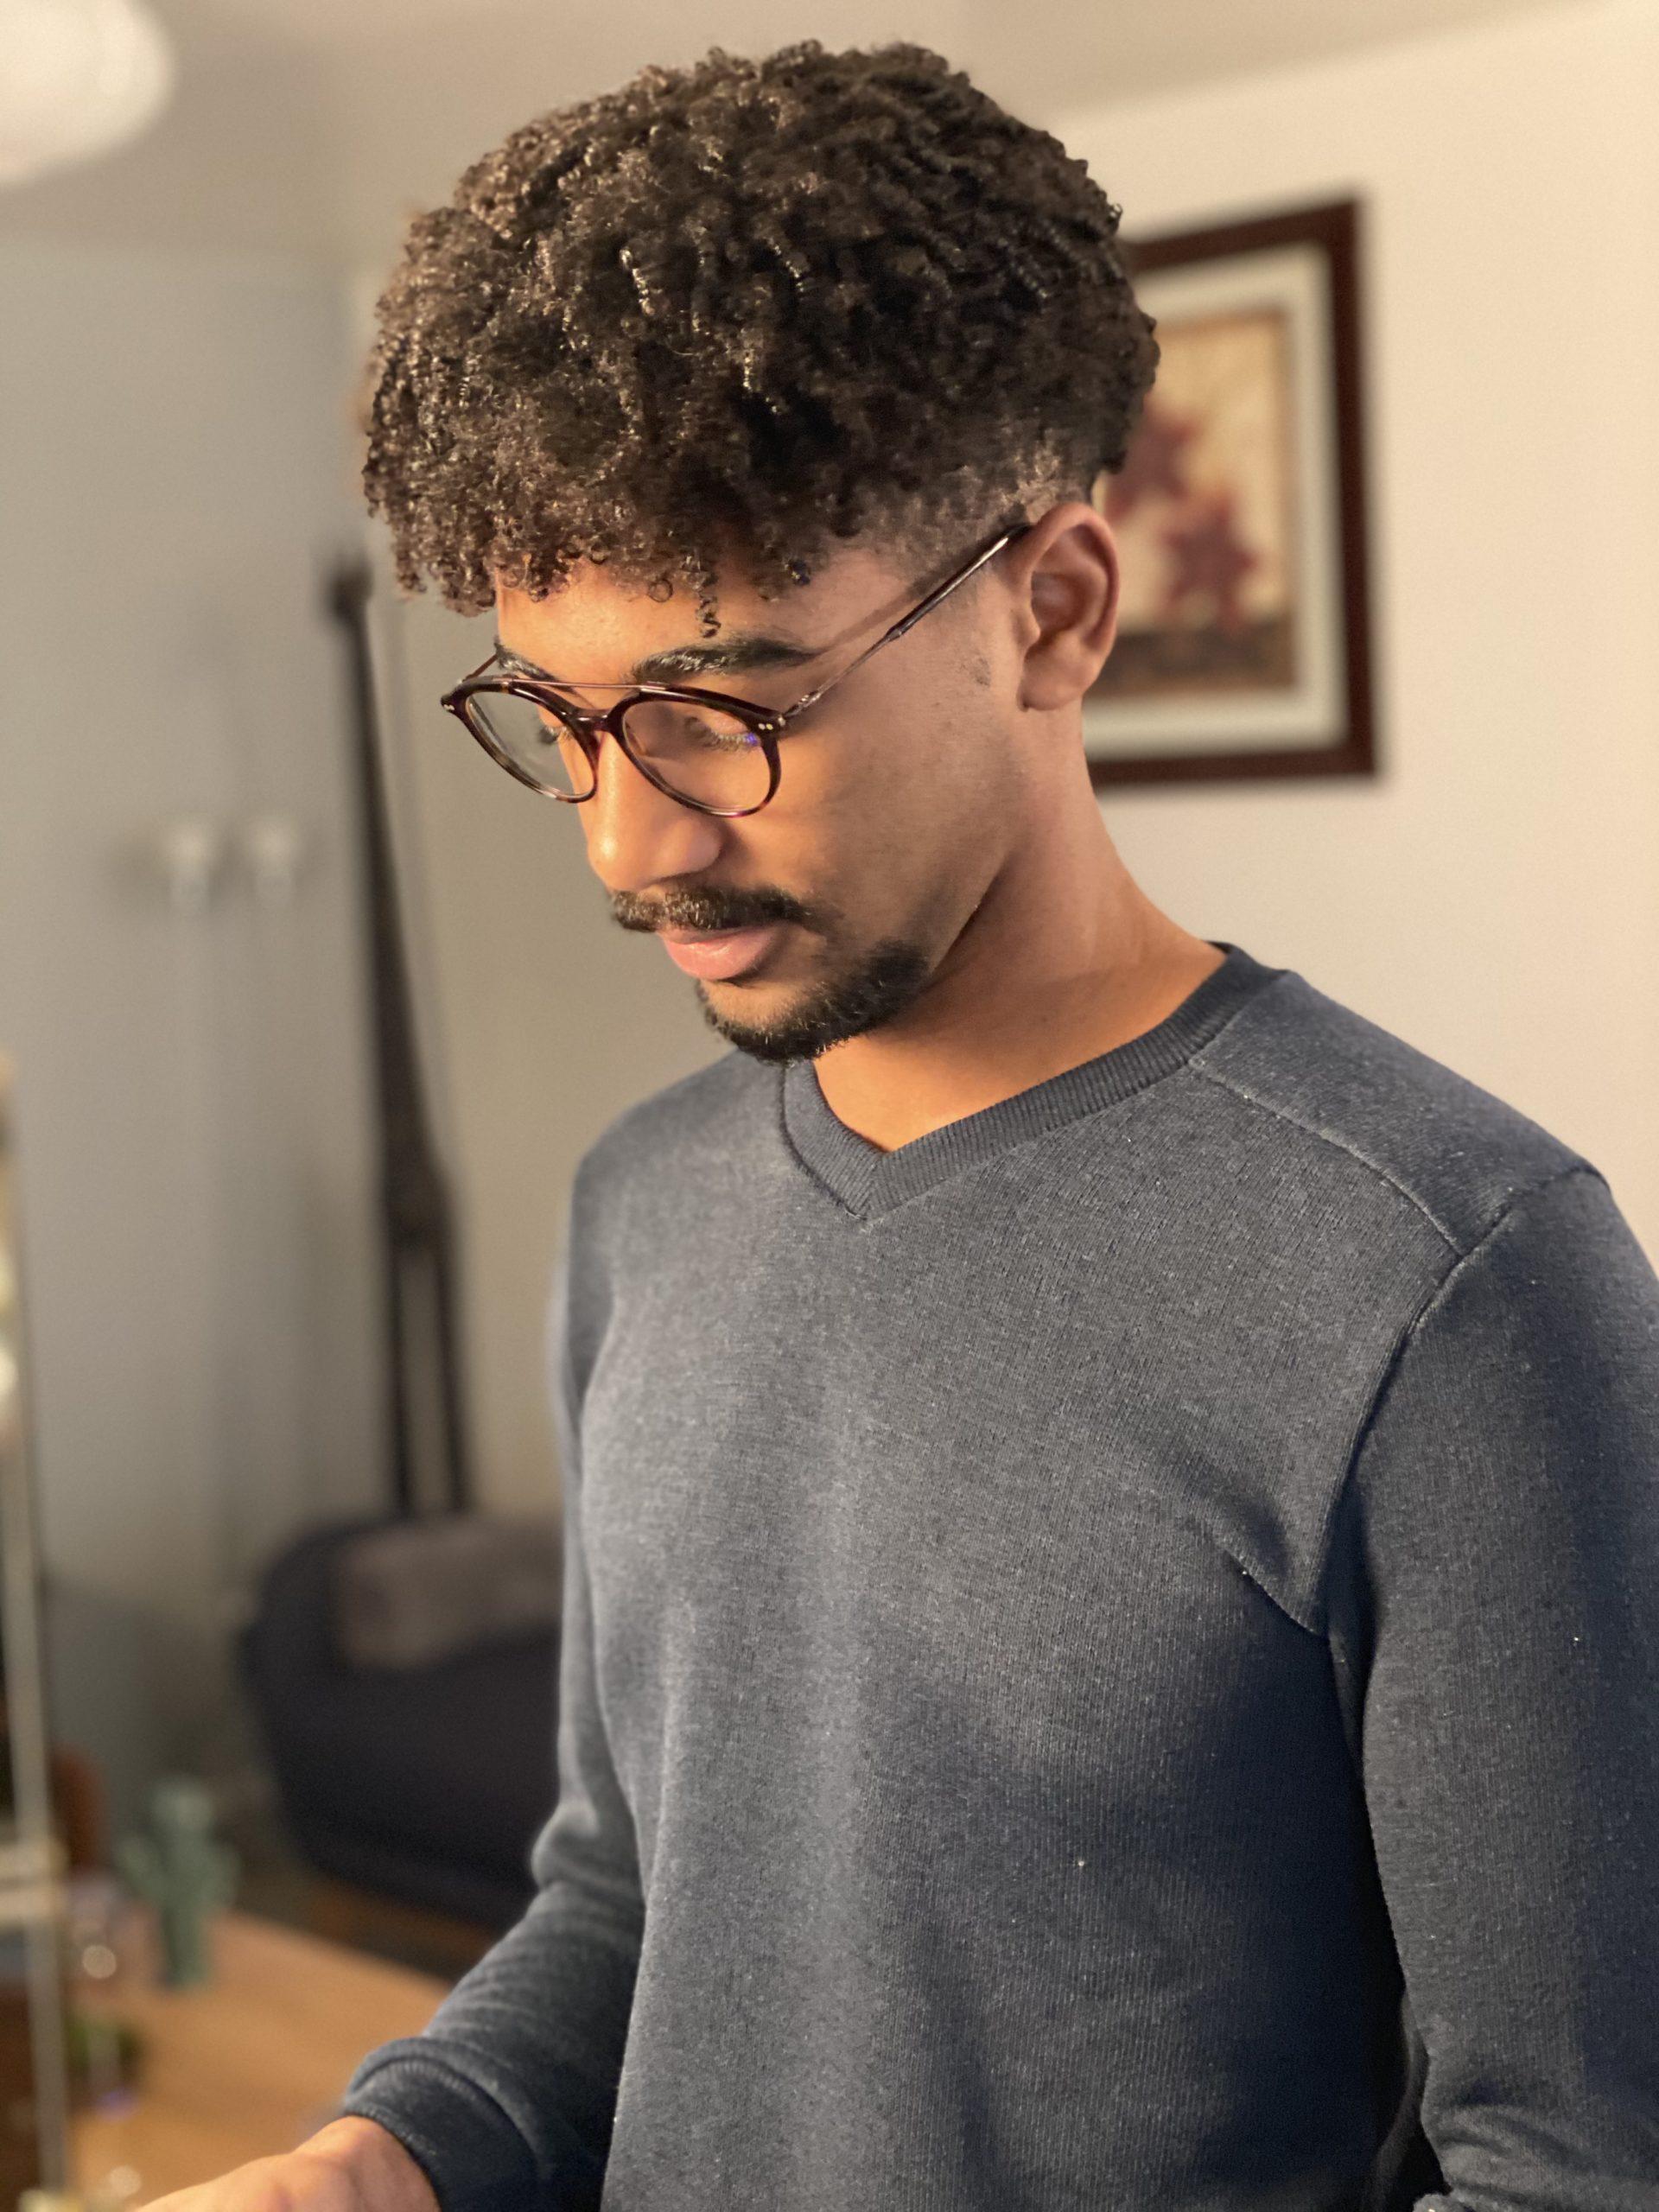 Short-Undercut-Trendy-Curly-Barbe-Hairstylesformenblack-Alexandre-Latelierbycolette-2019